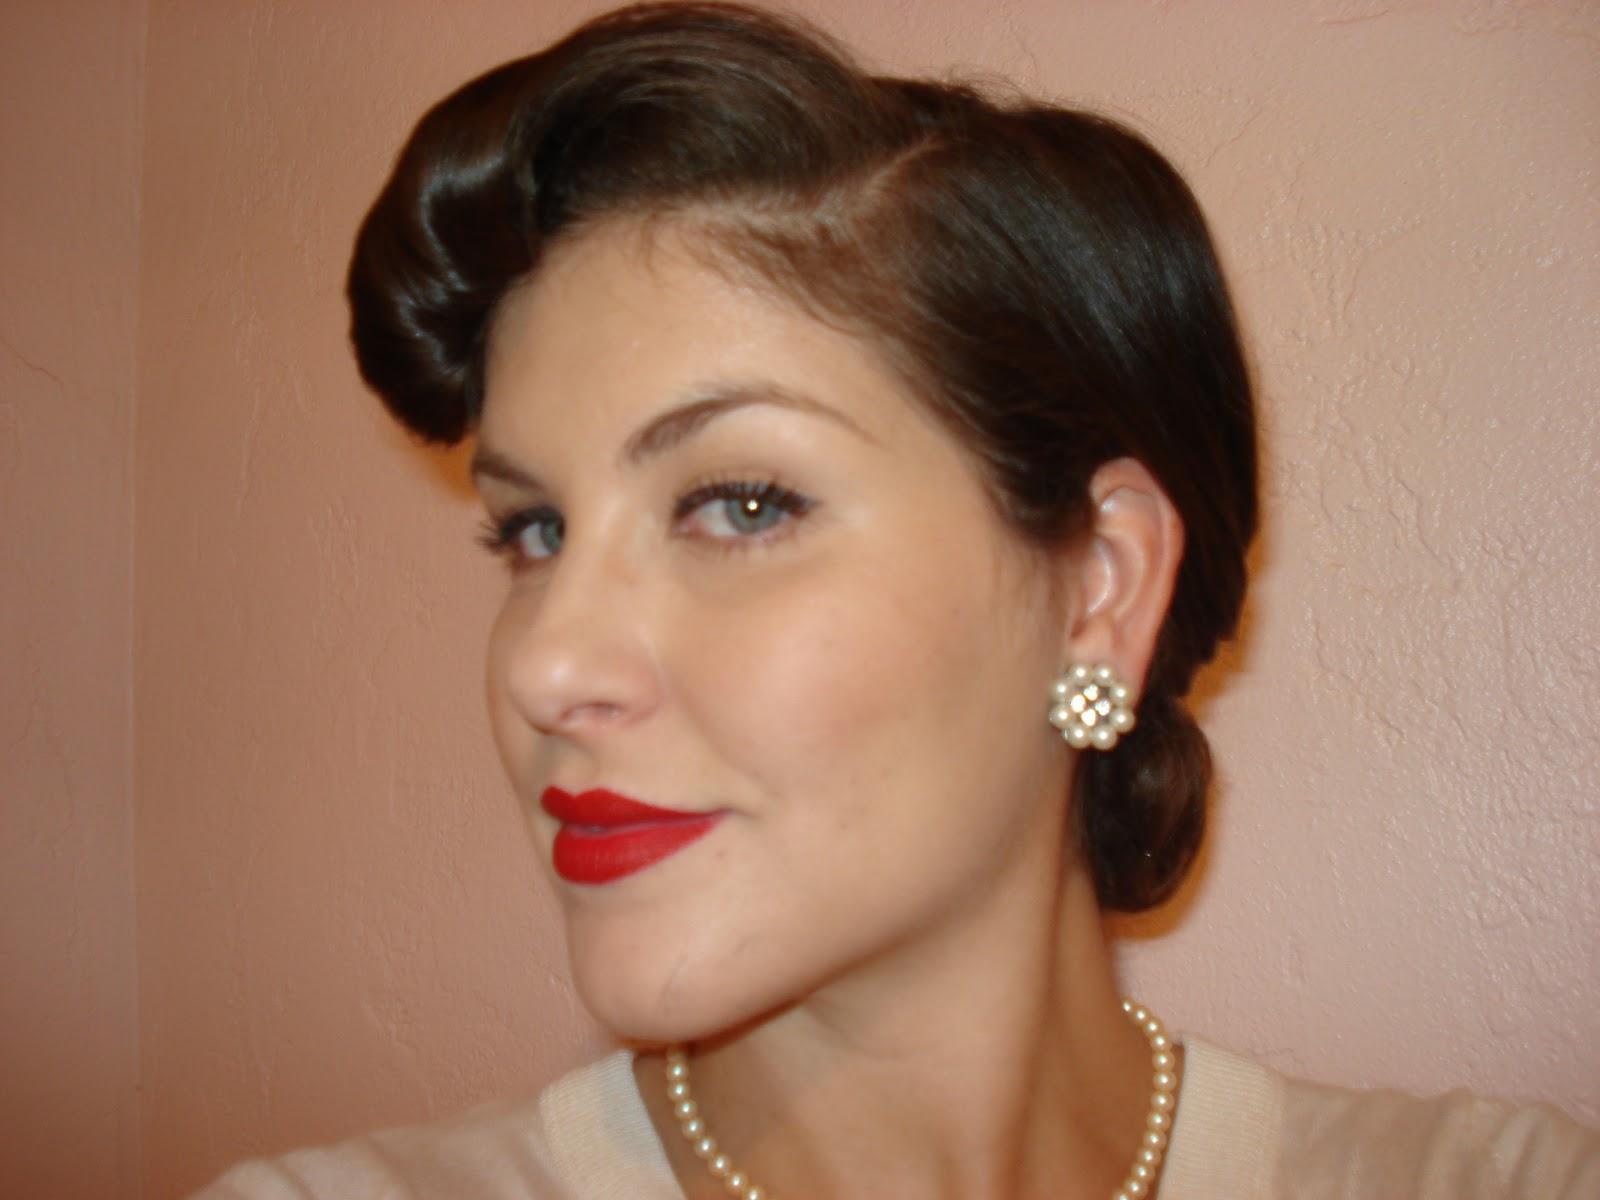 1980s mens hairstyles : Cute Hairstyle Tutorial- Hair How-To: Braided Wreath